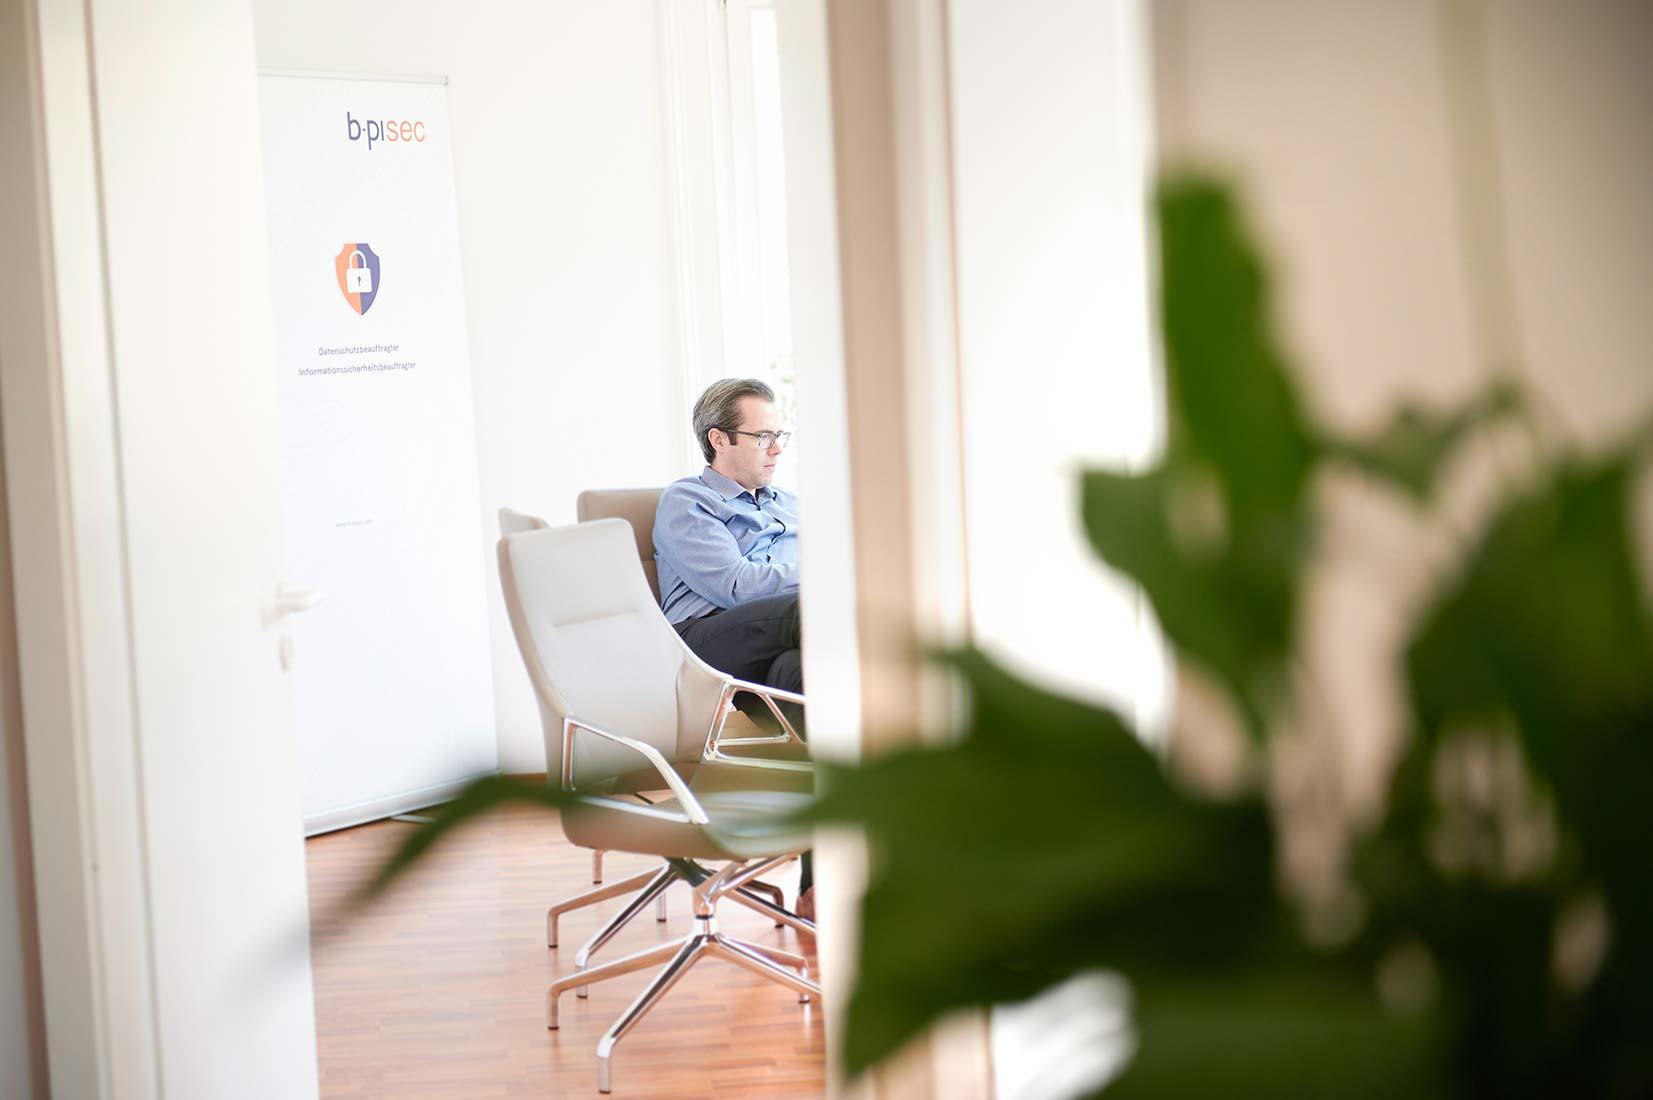 Corporate Portraitfoto Ambiente b-pisec GmbH in Limburg